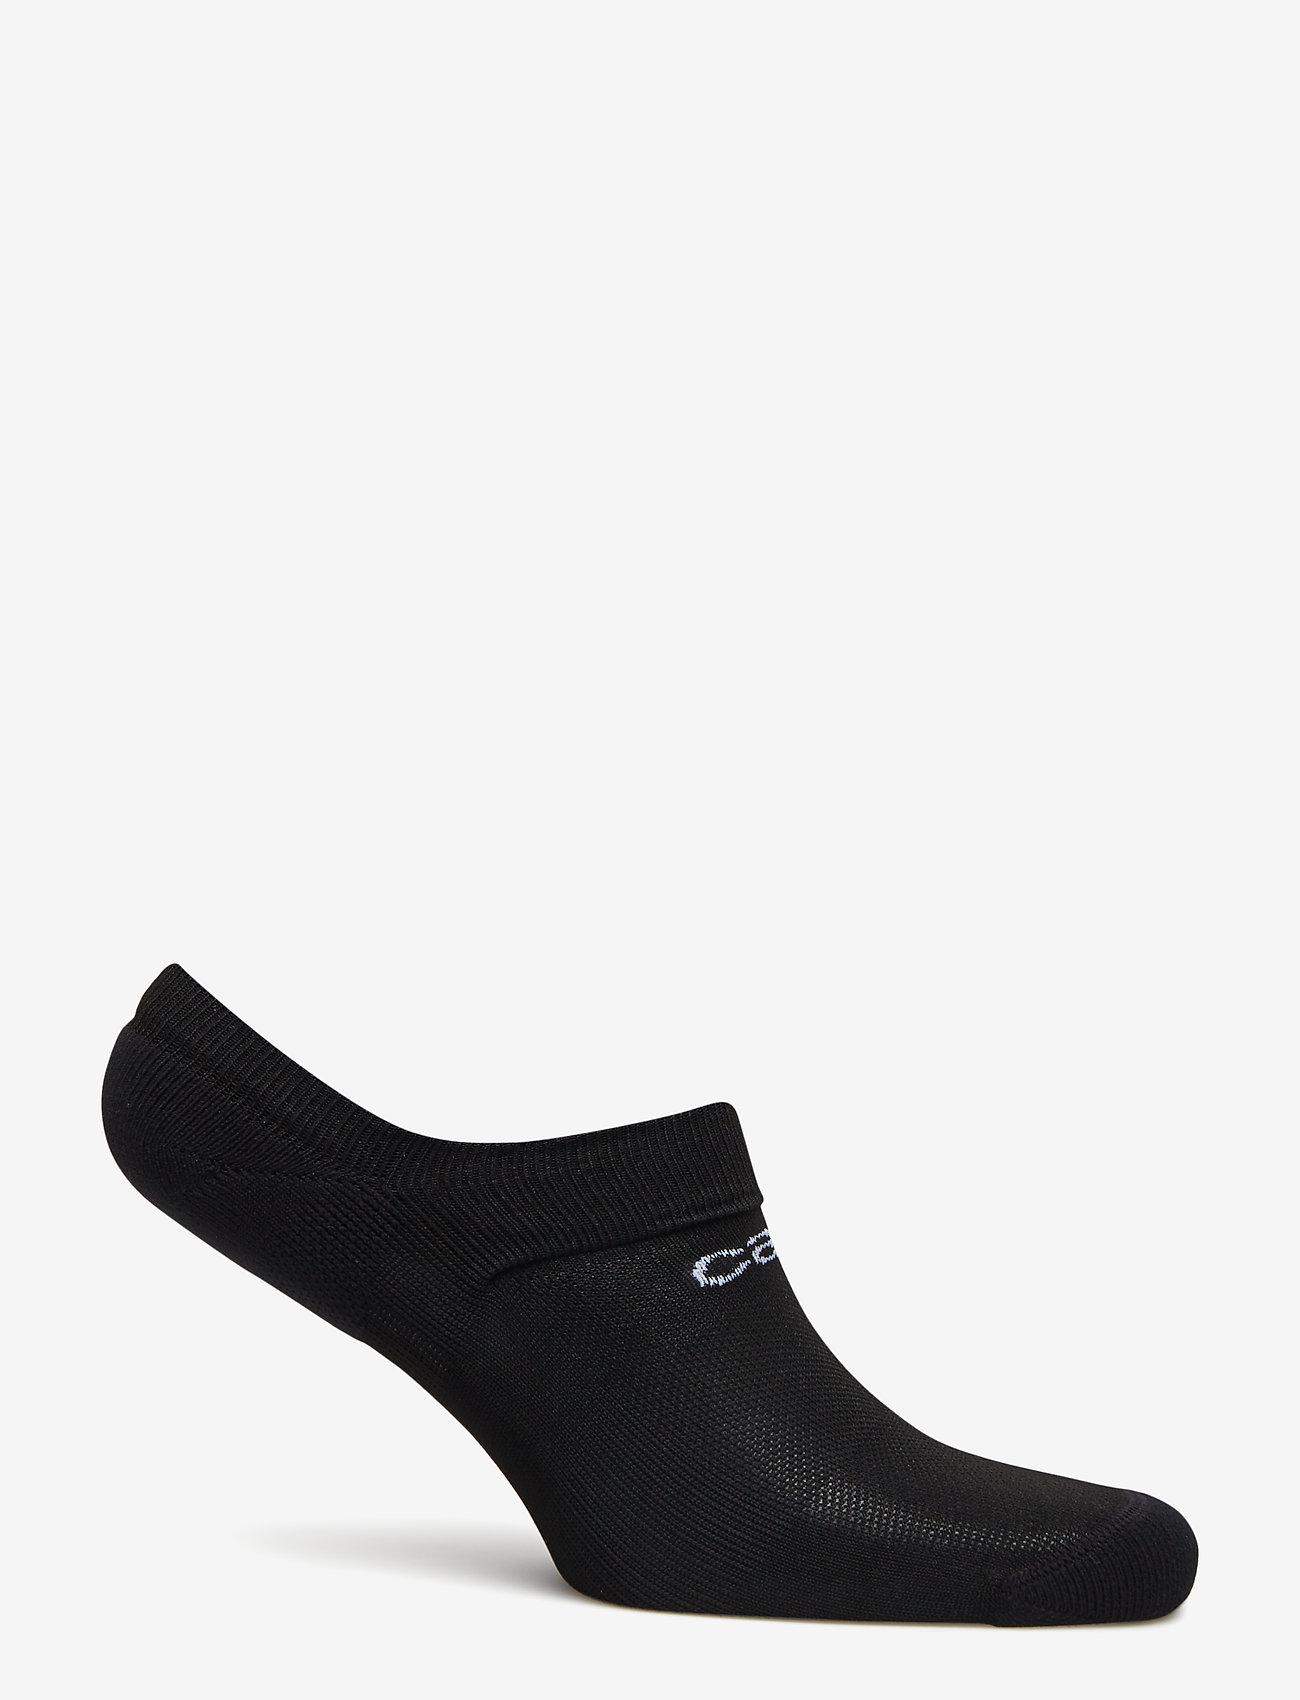 Casall - Traning sock - skarpetki do tenisówek - black - 1